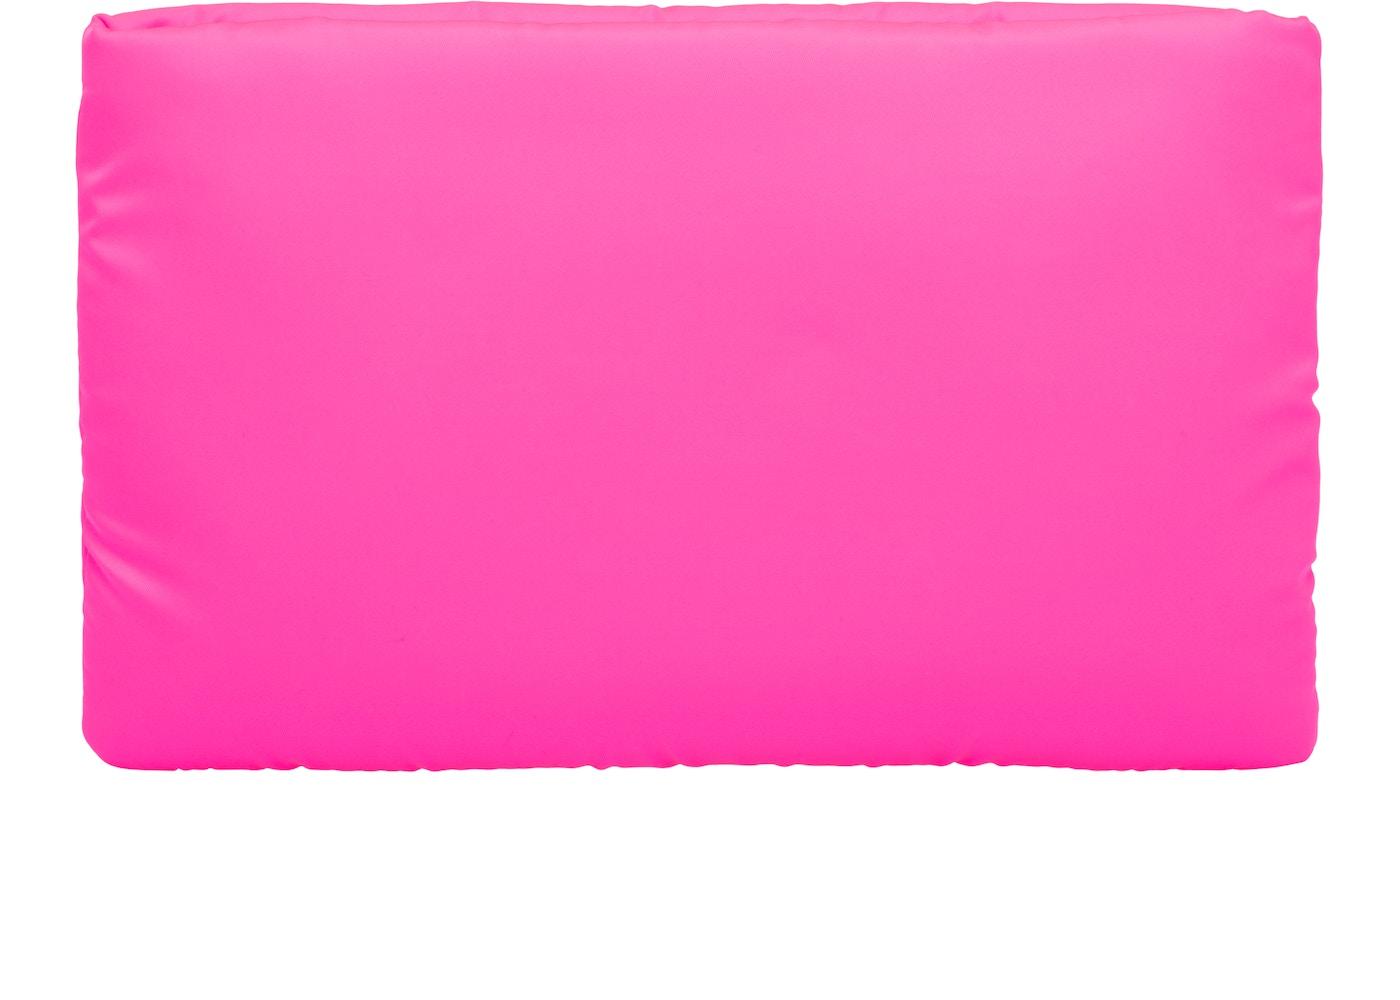 bbb20b12a932 Prada Clutch Padded Nylon Medium Pink